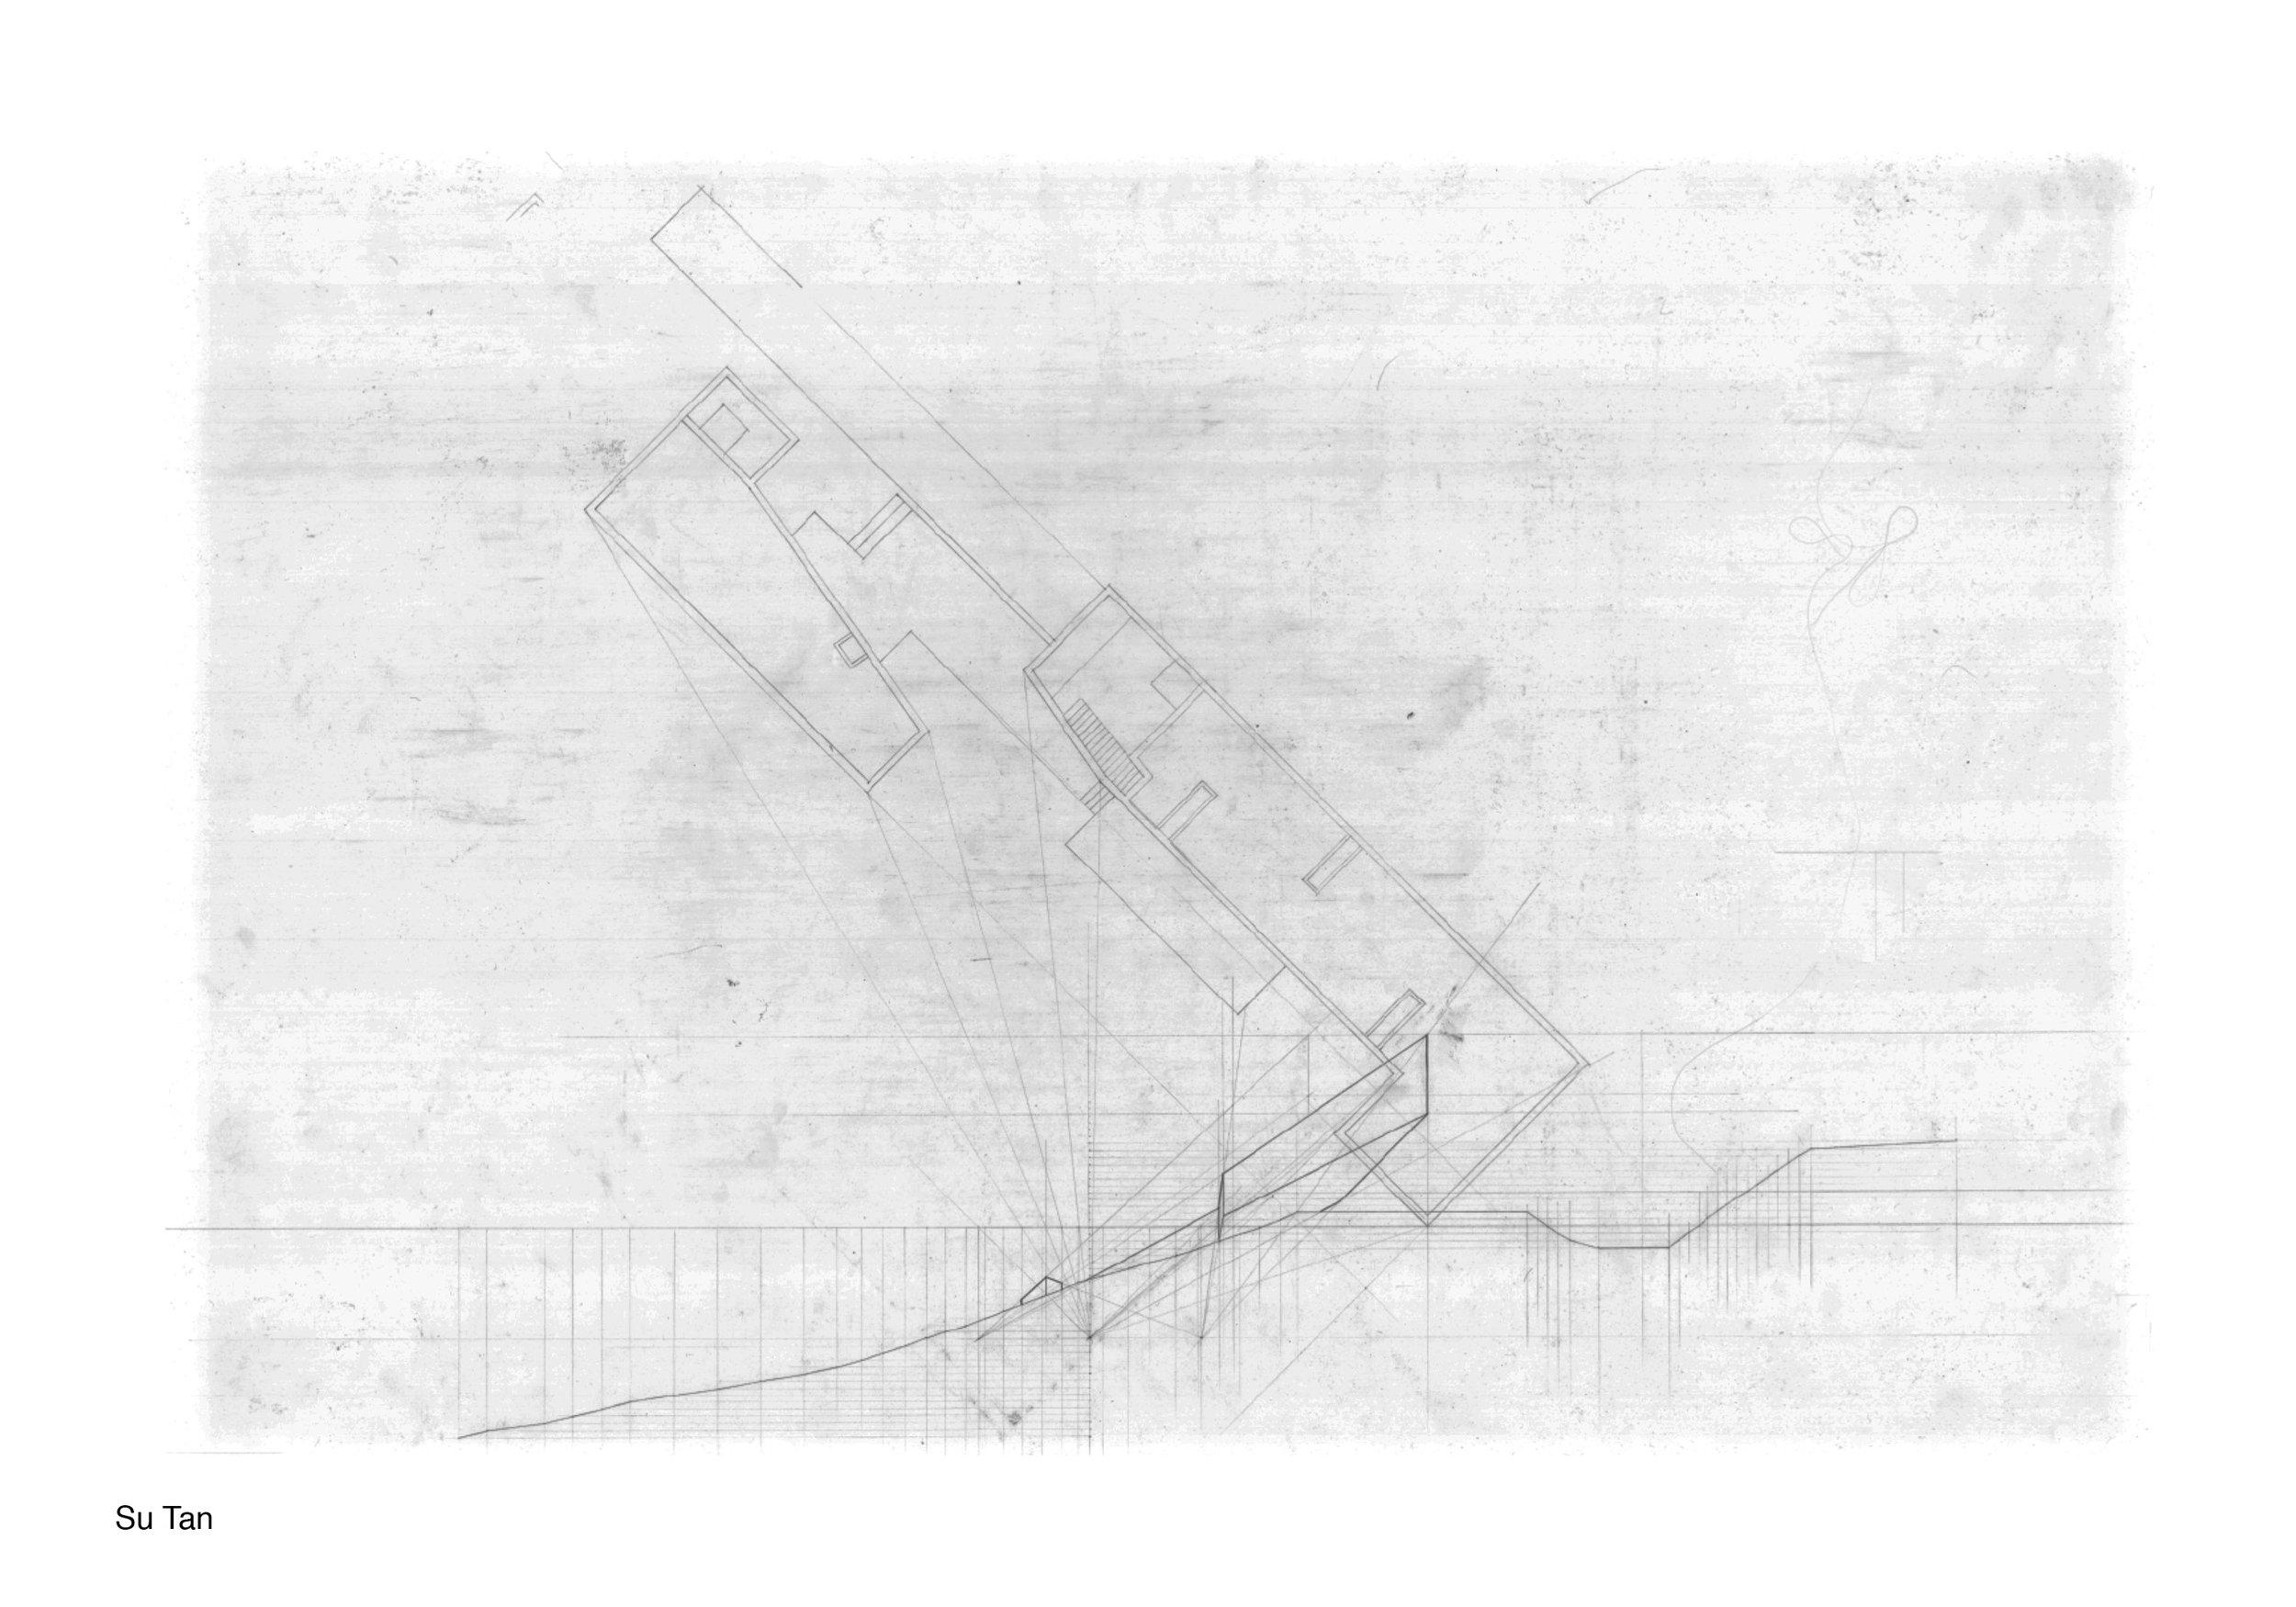 SIMONE_(SELECT)_layout_file_OCEANIC20[1].jpg